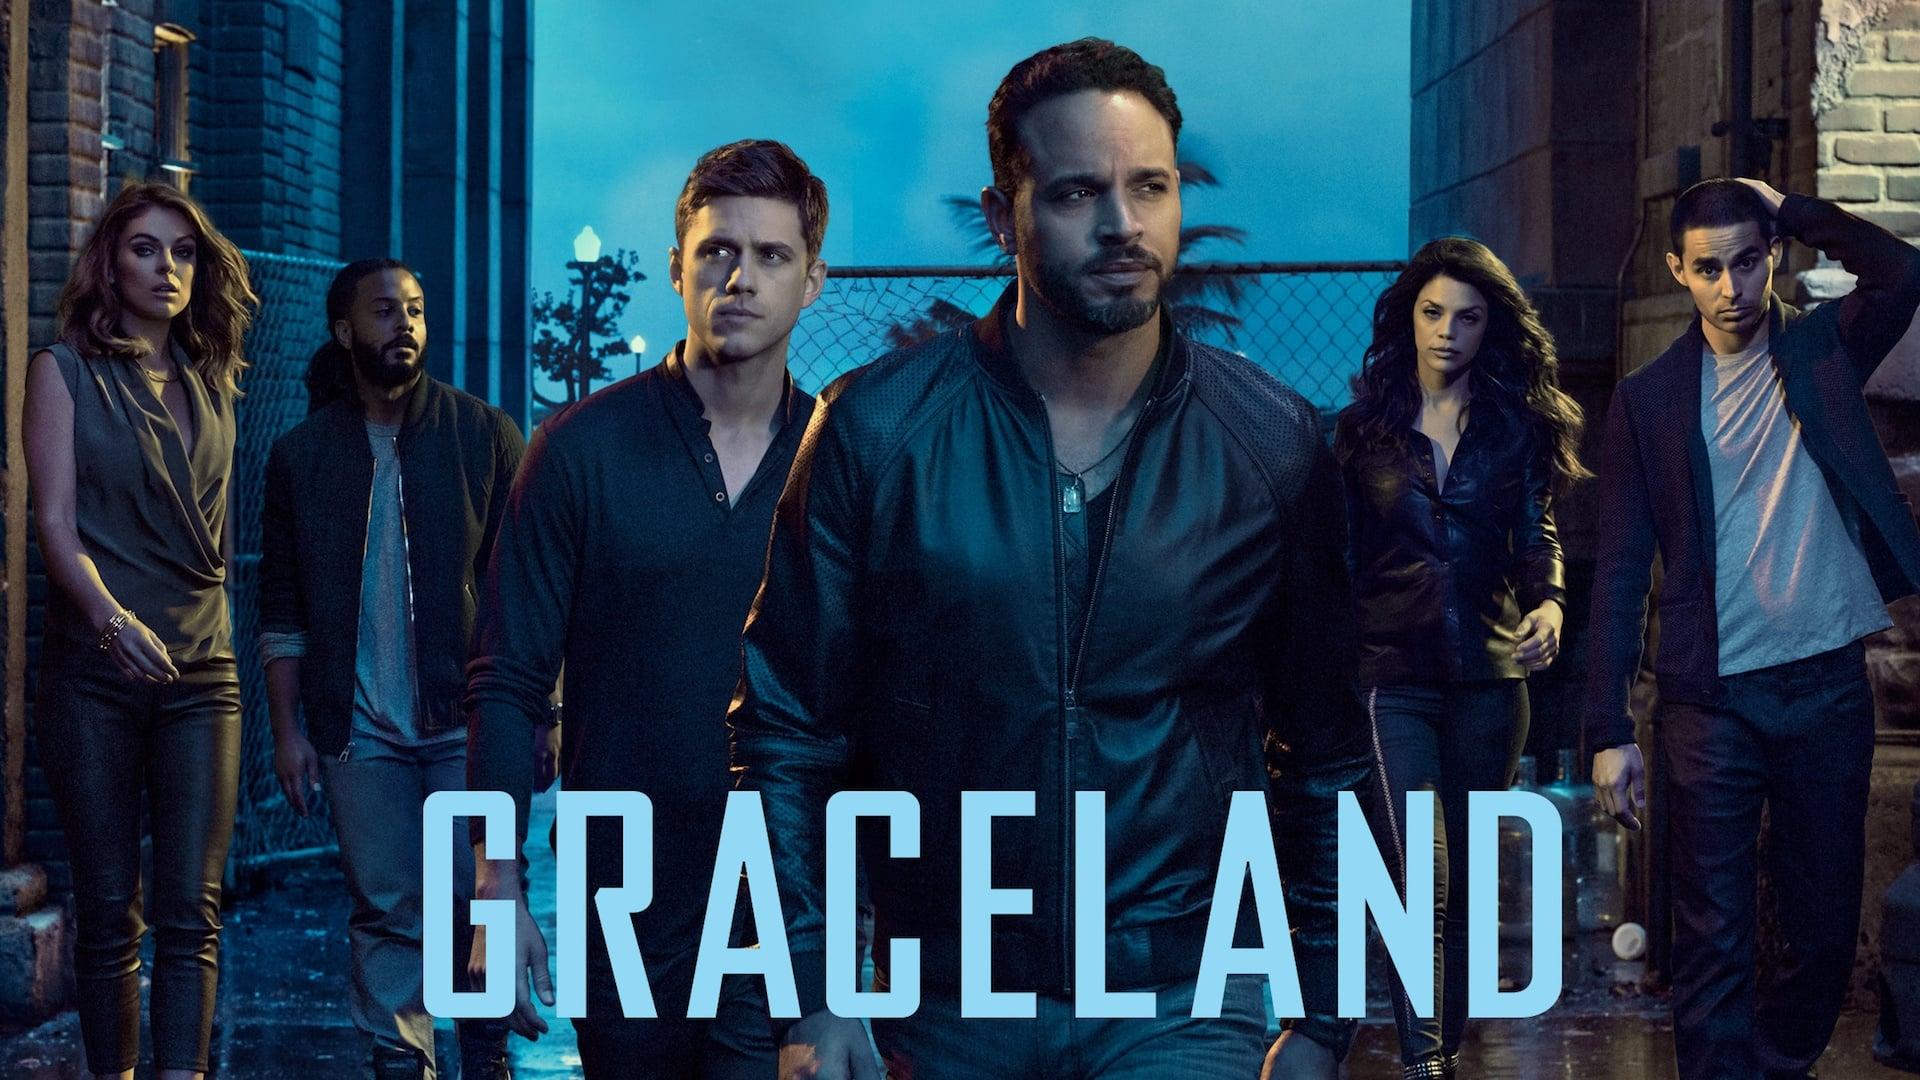 Graceland | TV fanart | fanart.tv  |Graceland Tv Show